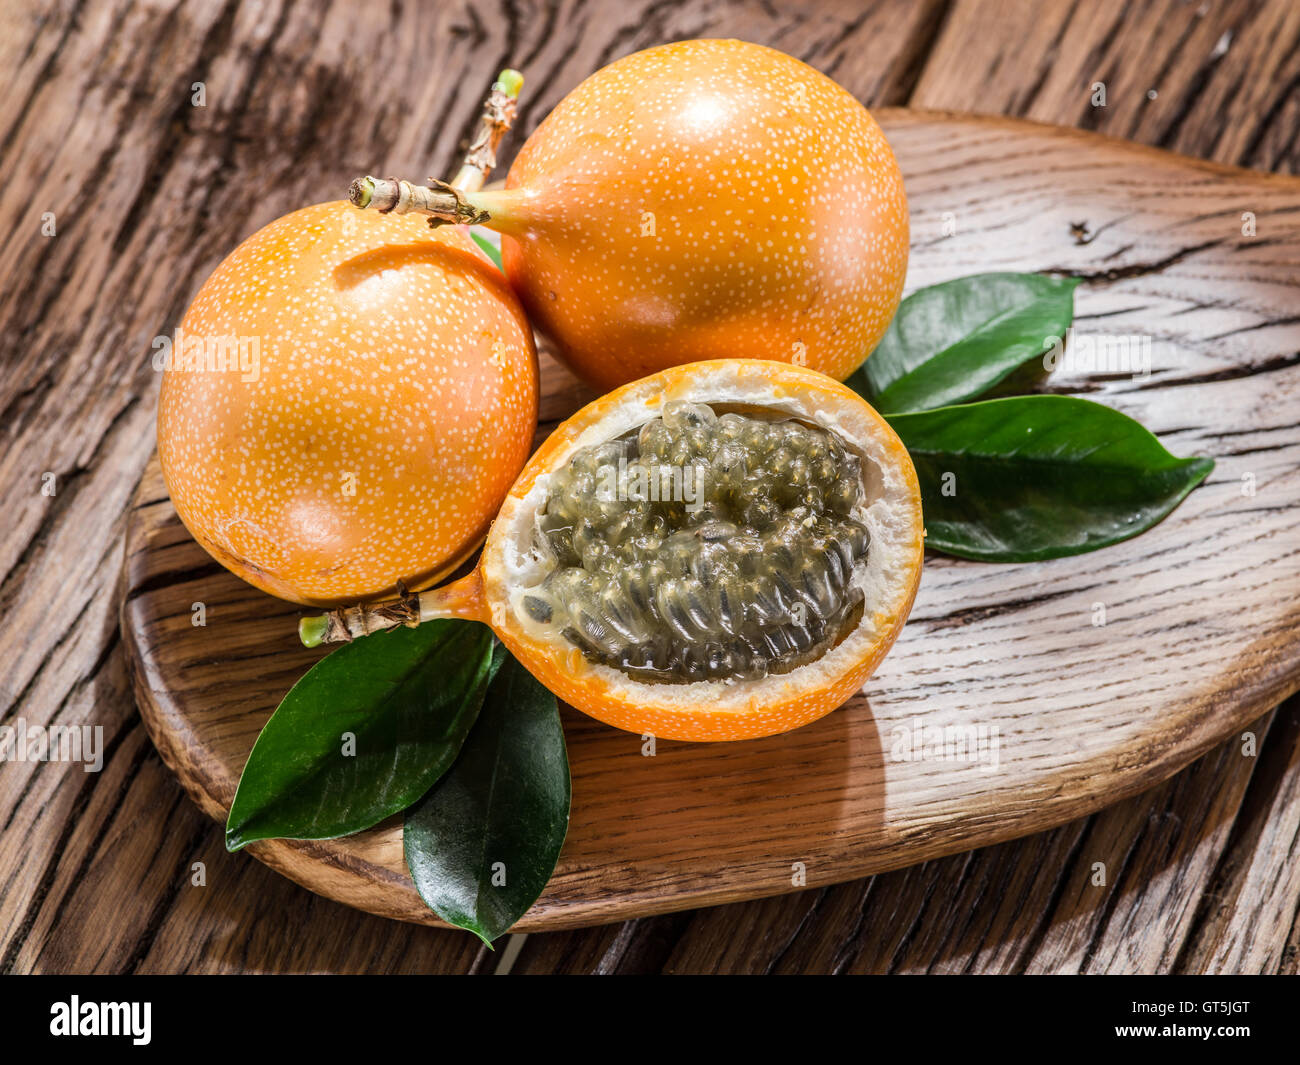 Granadilla fruits on the wooden table. - Stock Image